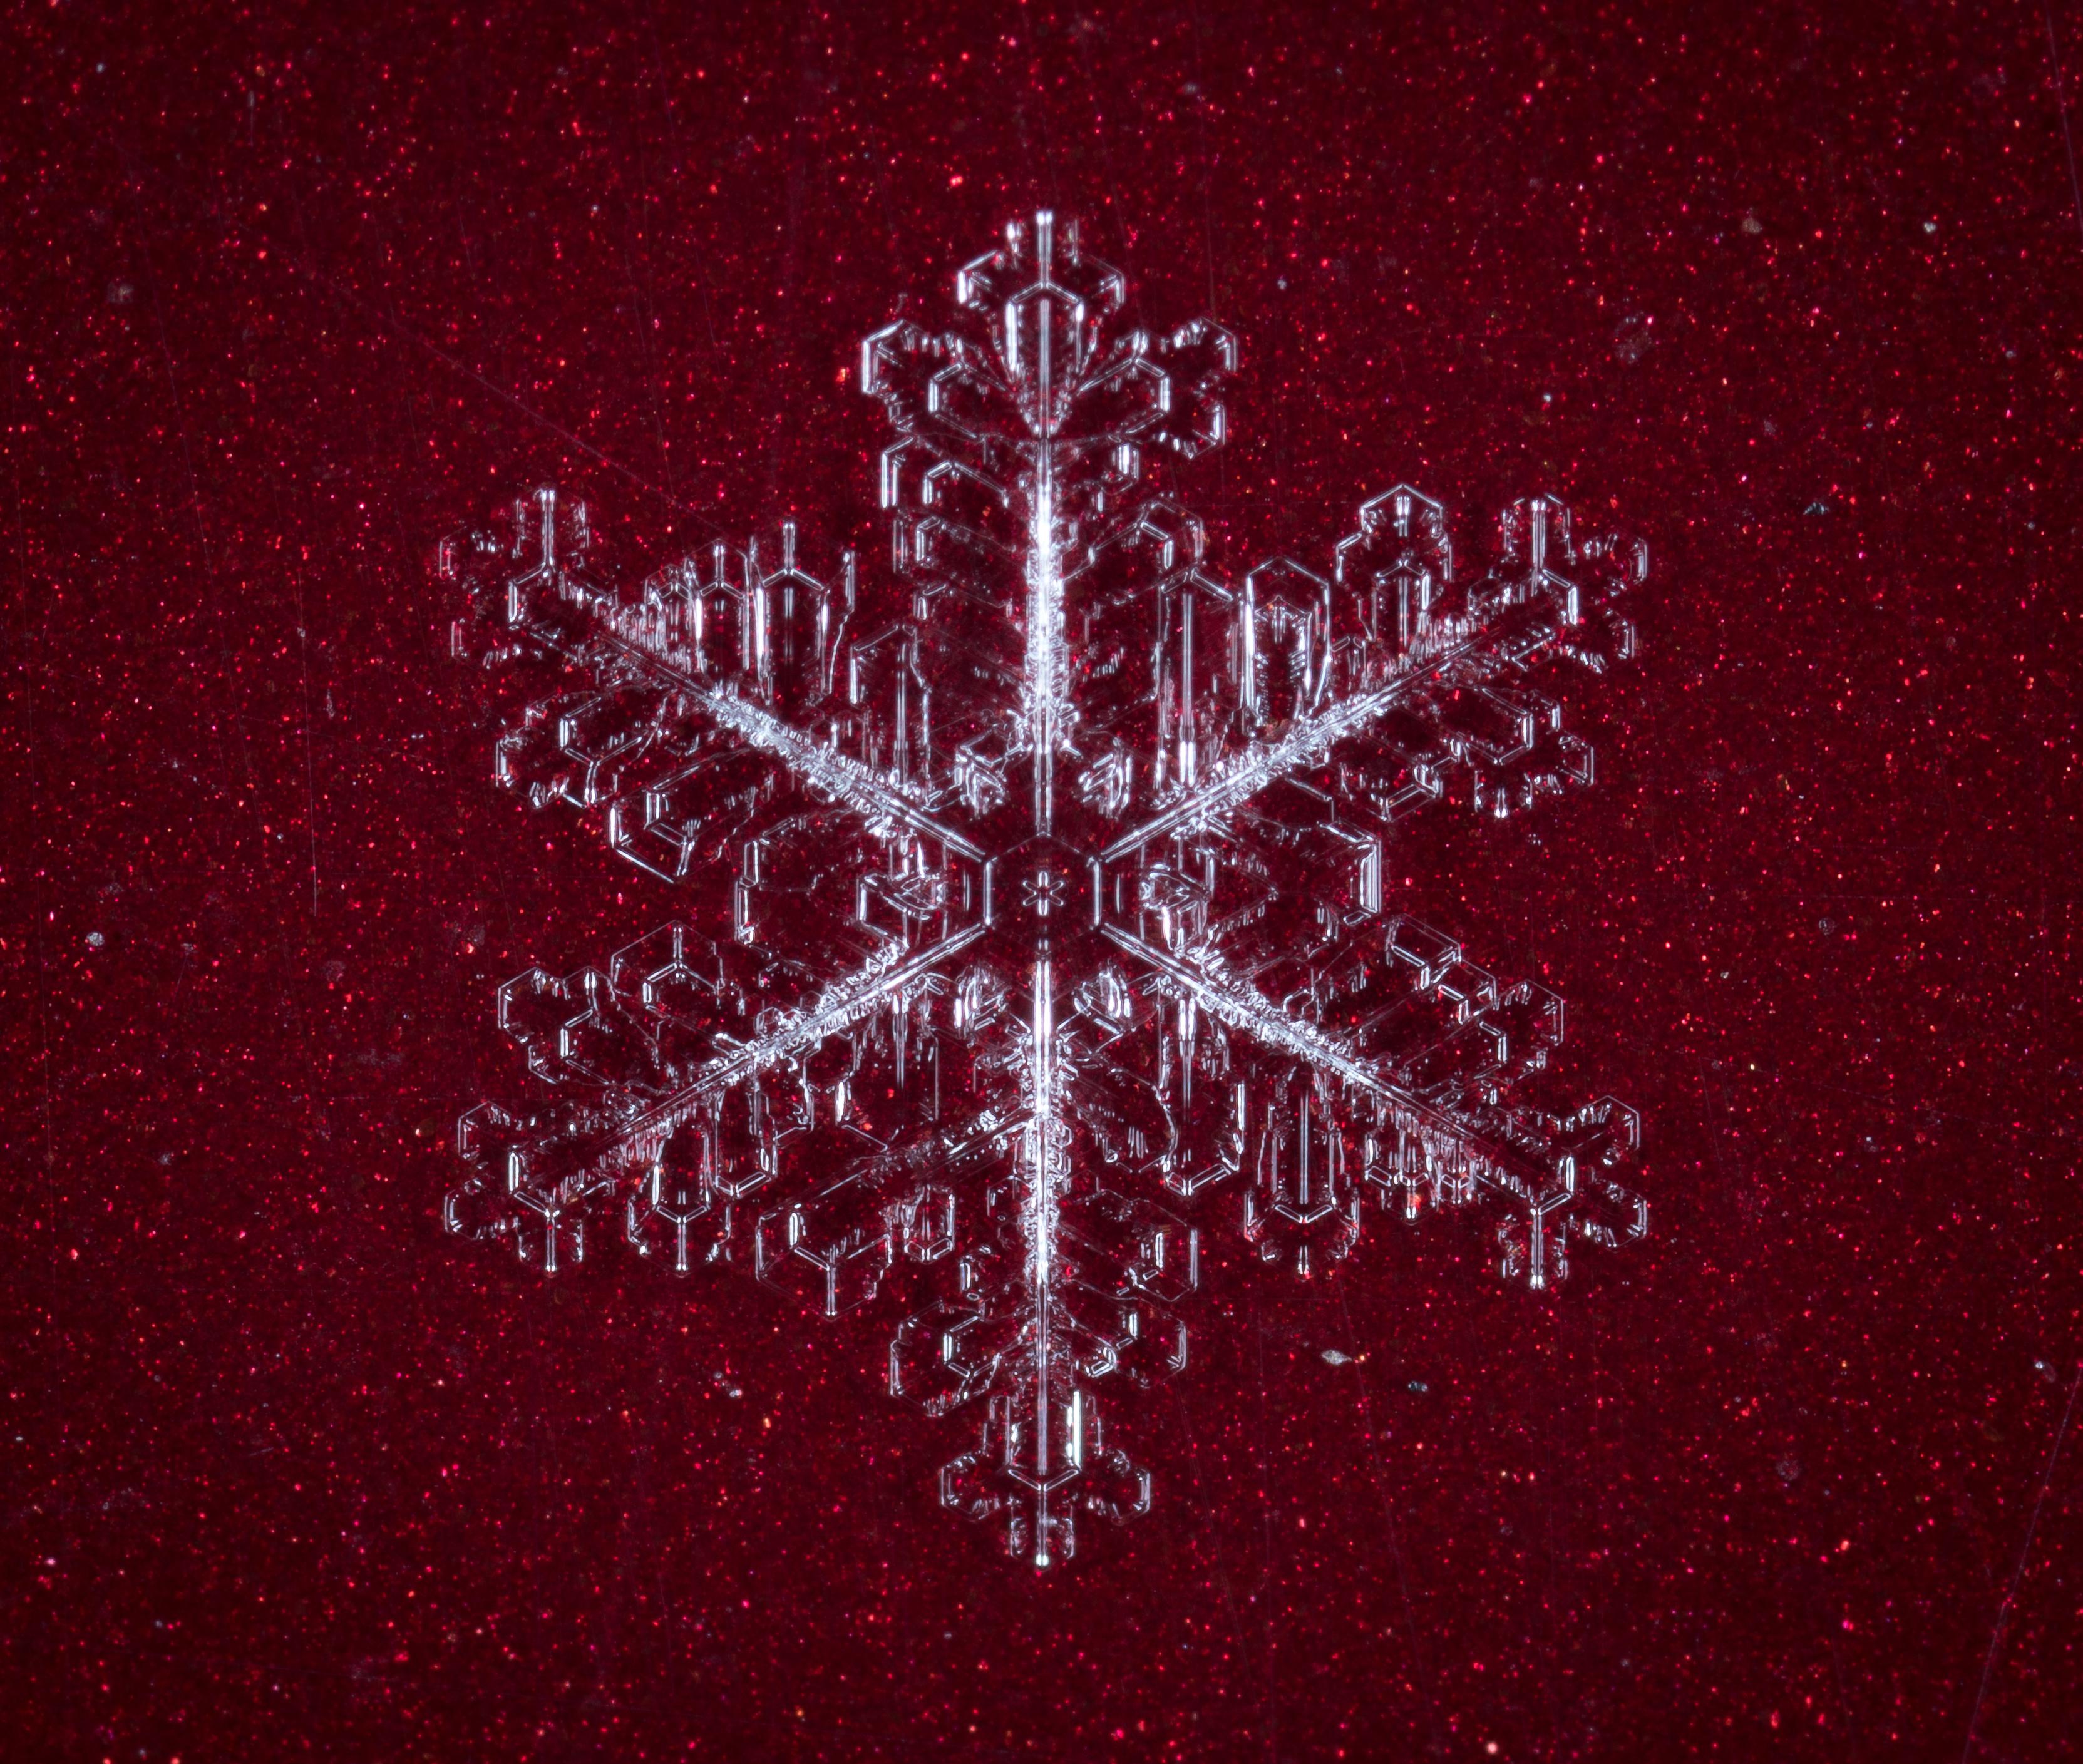 Kostenlose foto : Schnee, Makro, Schneeflocke, Computer-Tapete ...